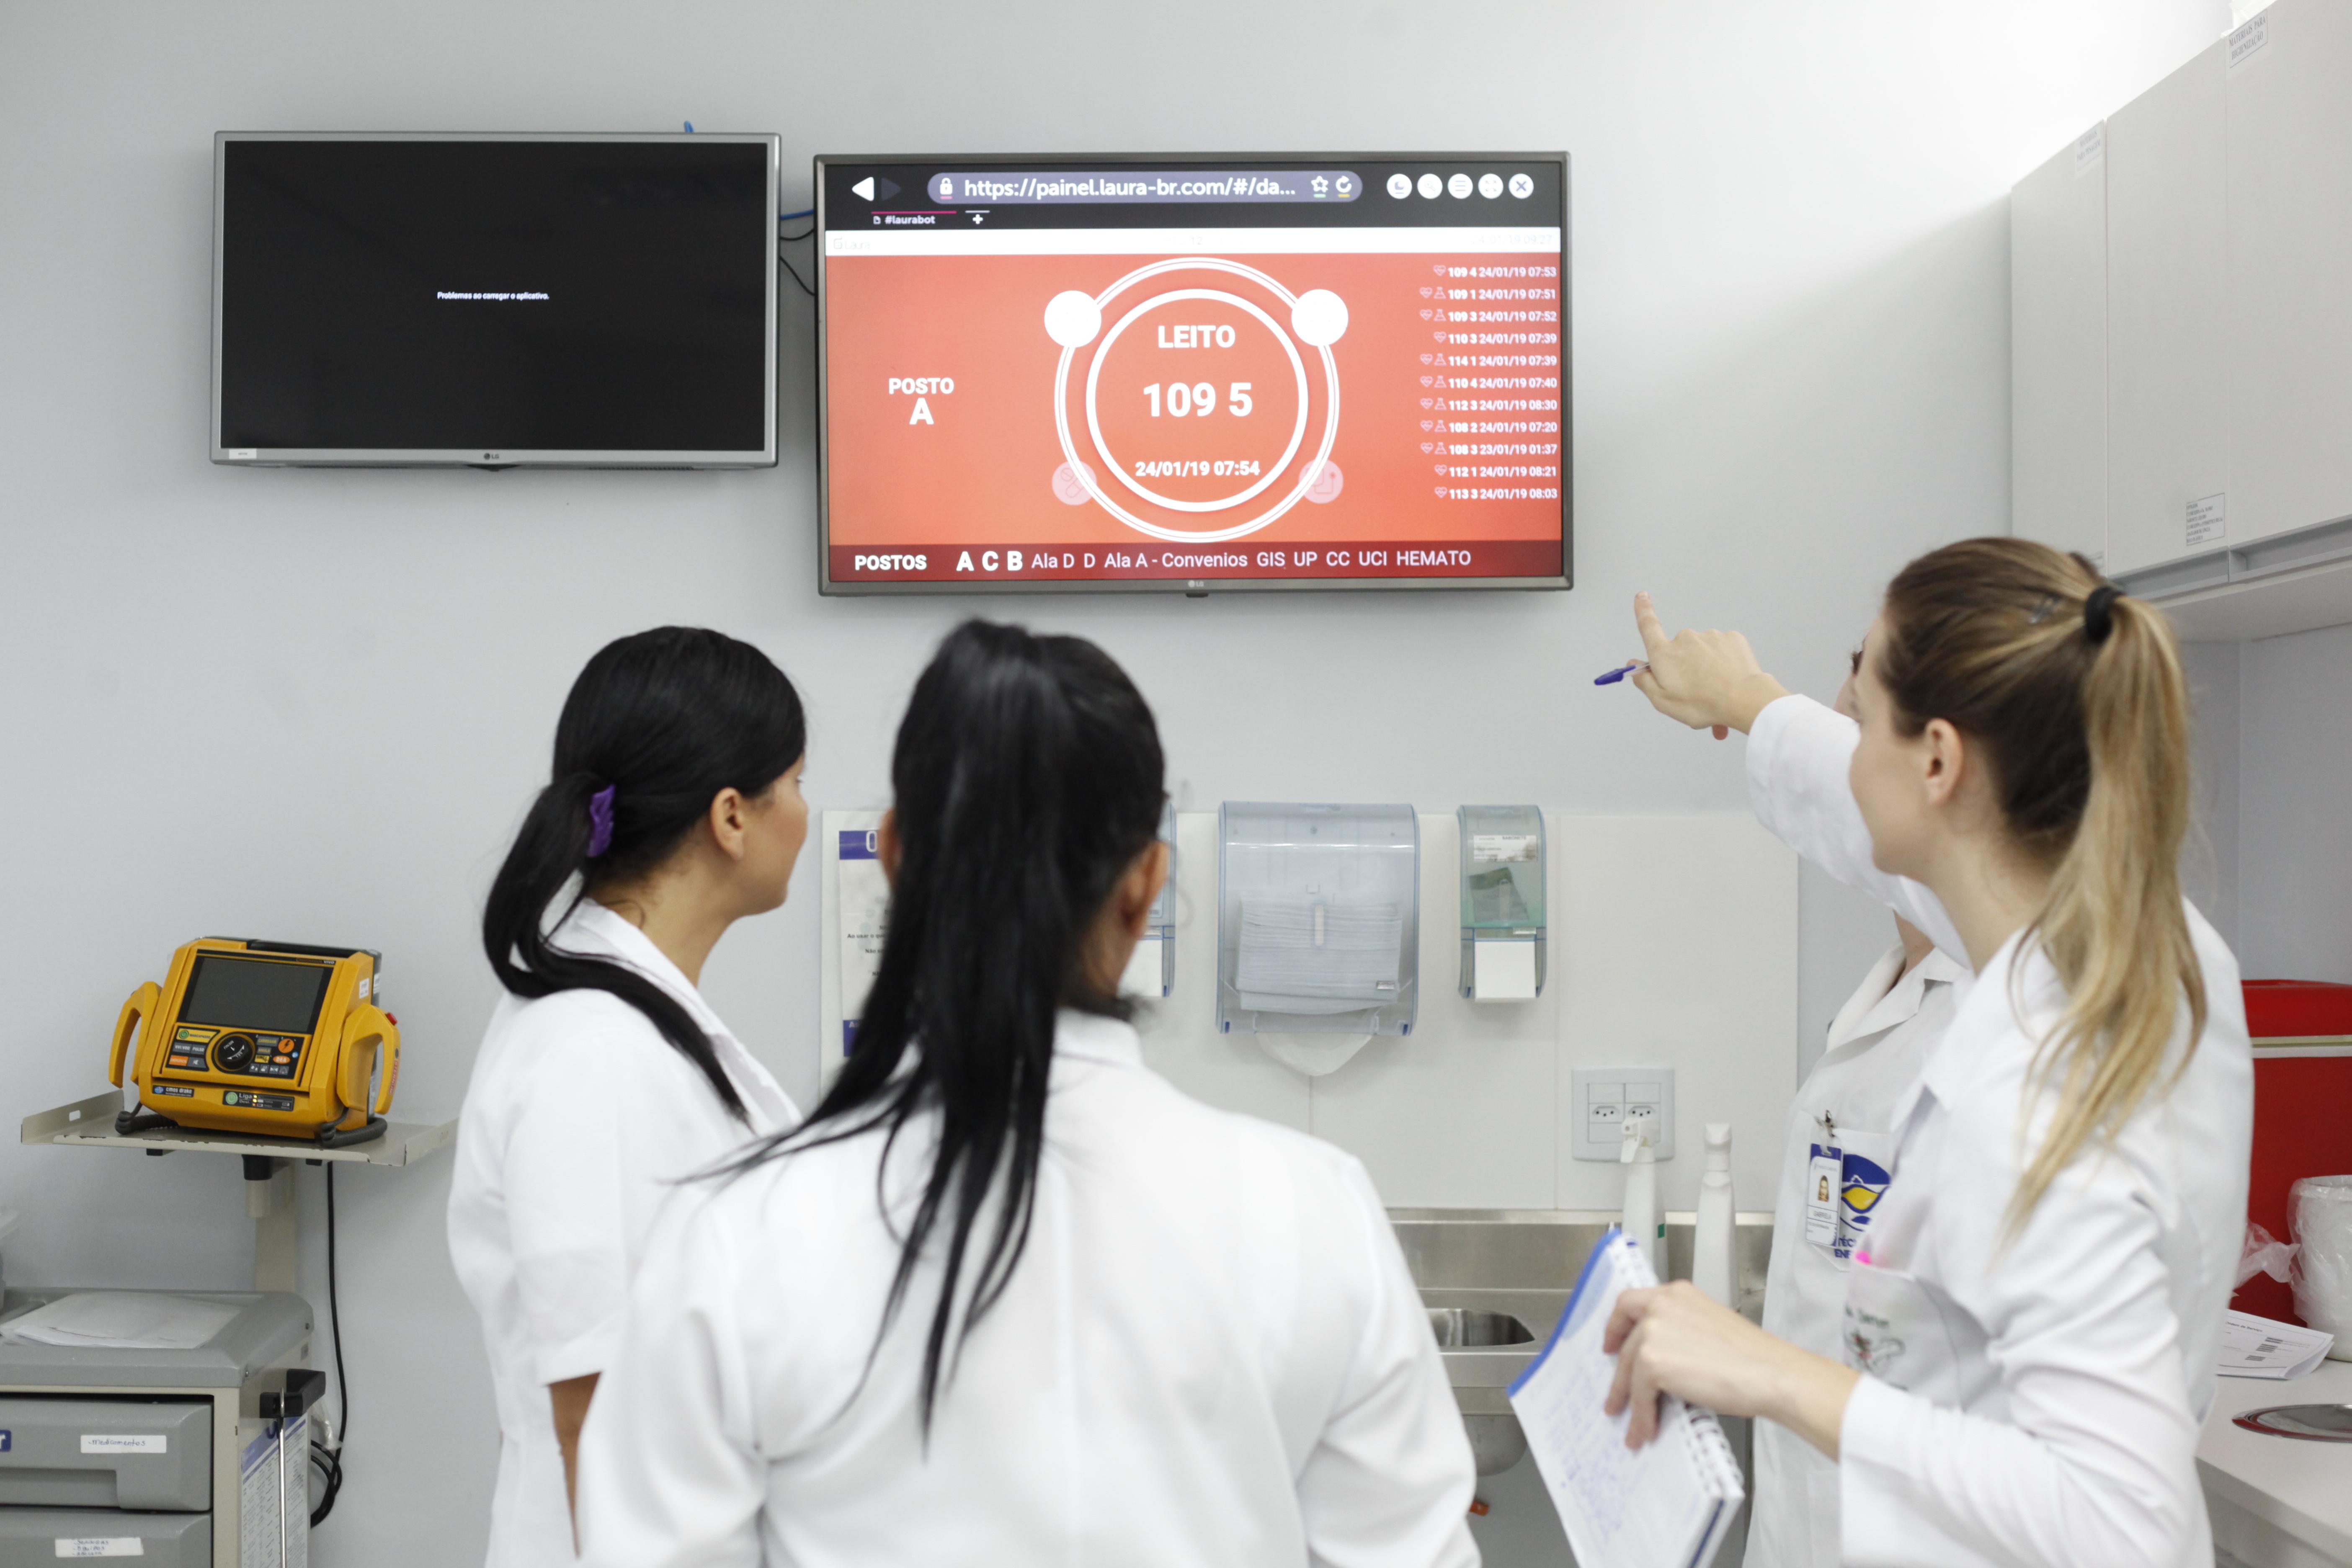 Tecnologia na saúde - Robô Laura